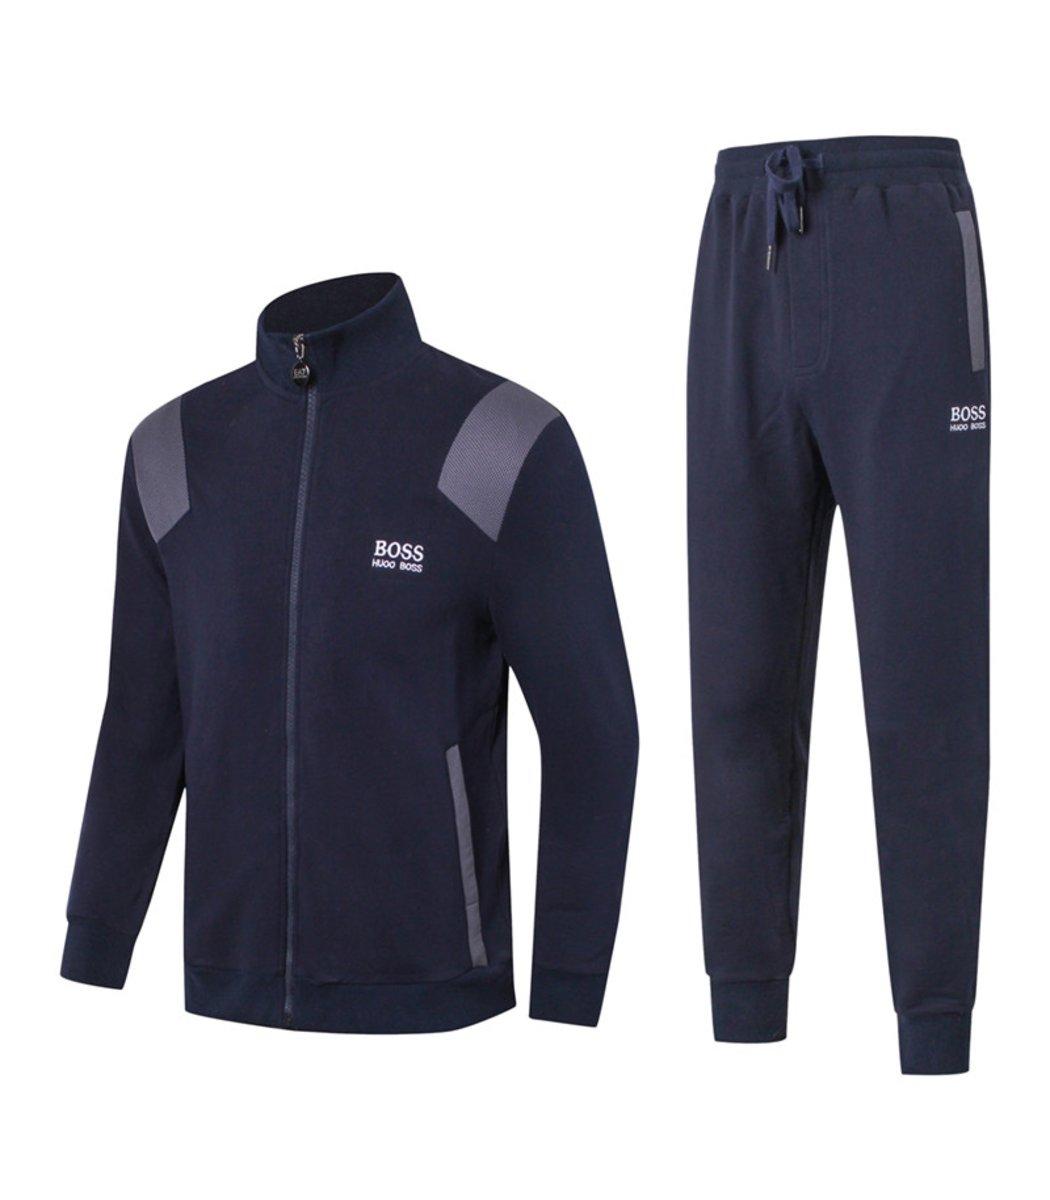 Спортивный костюм Hugo Boss Training Синий